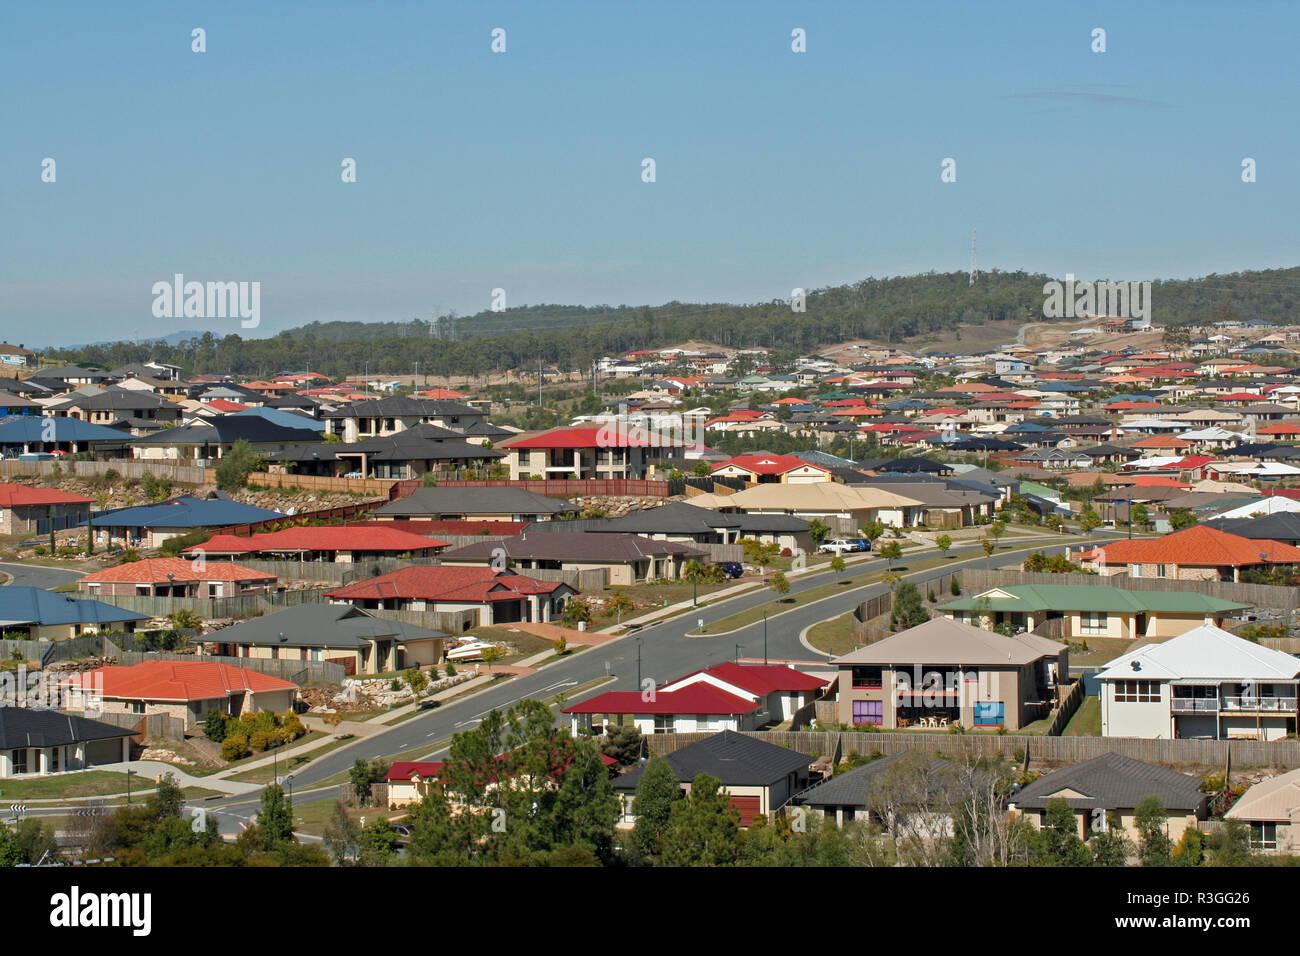 RESIDENTIAL HOUSING ESTATE, QUEENSLAND, AUSTRALIA - Stock Image